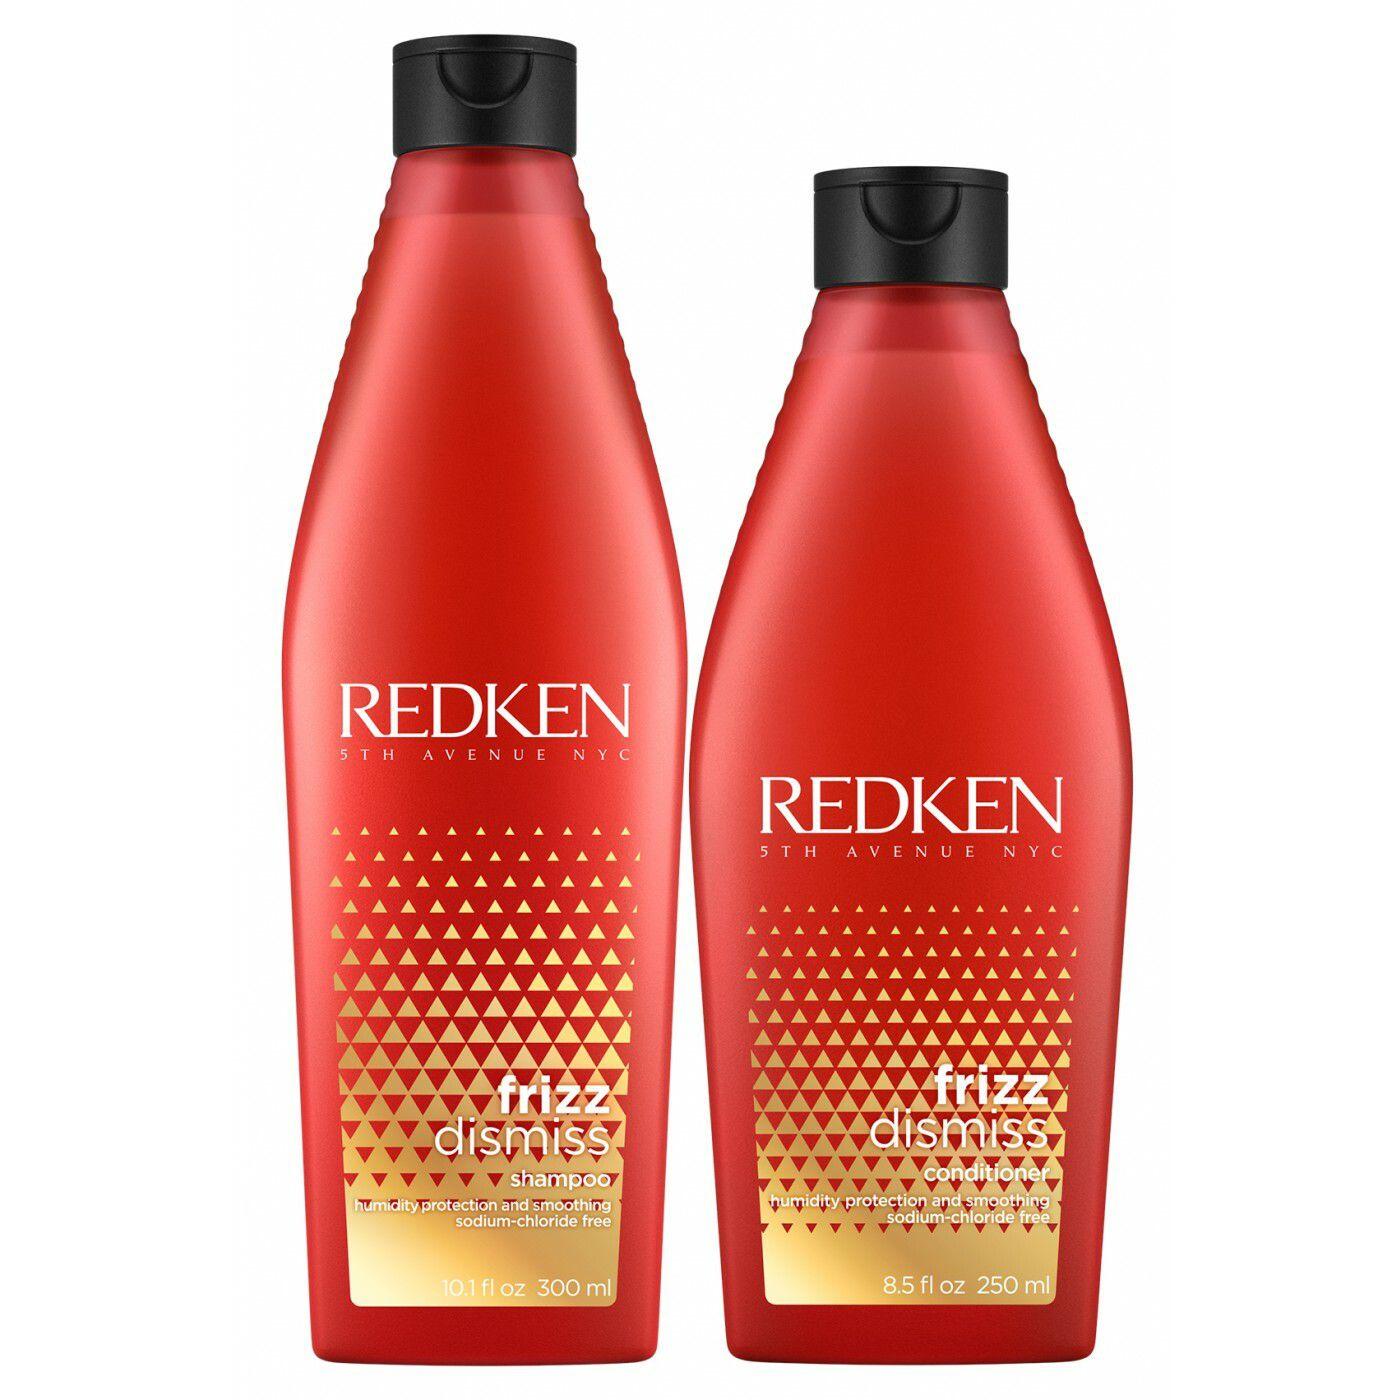 Kit Redken Frizz Dismiss: Shampoo 300ml + Condicionador 250ml